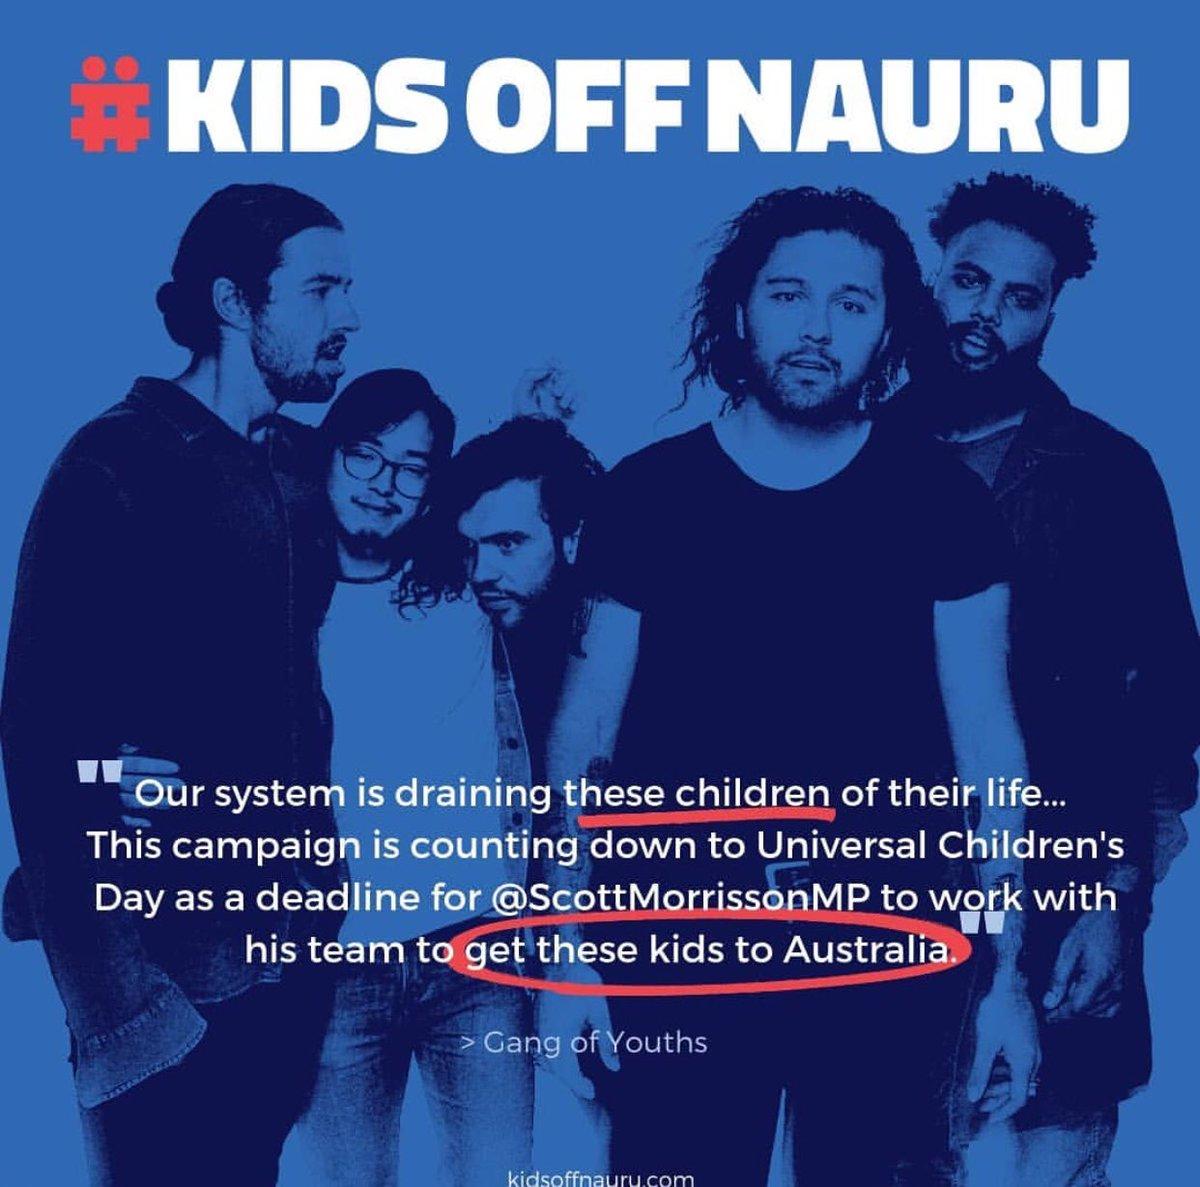 RT @jarrodmckenna: Gang of Youths message to @ScottMorrisonMP #KIDSOFFNAURU https://t.co/zKM52H7spX